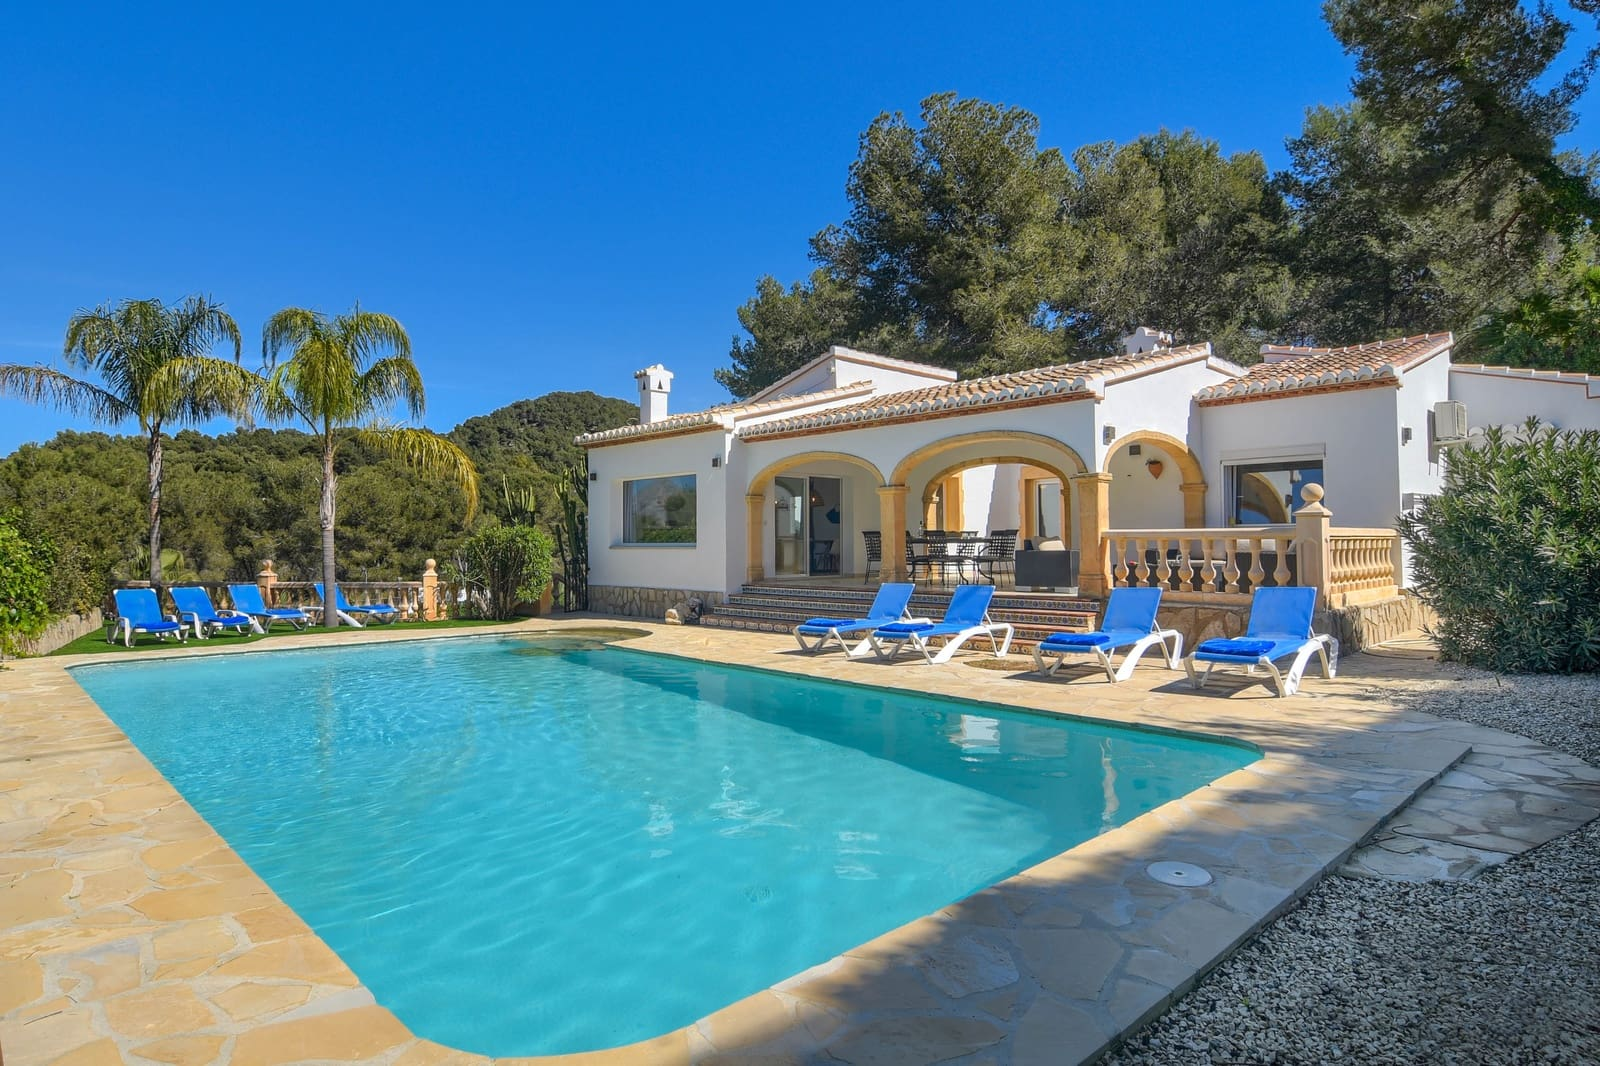 4 bedroom Villa for holiday rental in Javea / Xabia with pool garage - € 1,254 (Ref: 5988687)